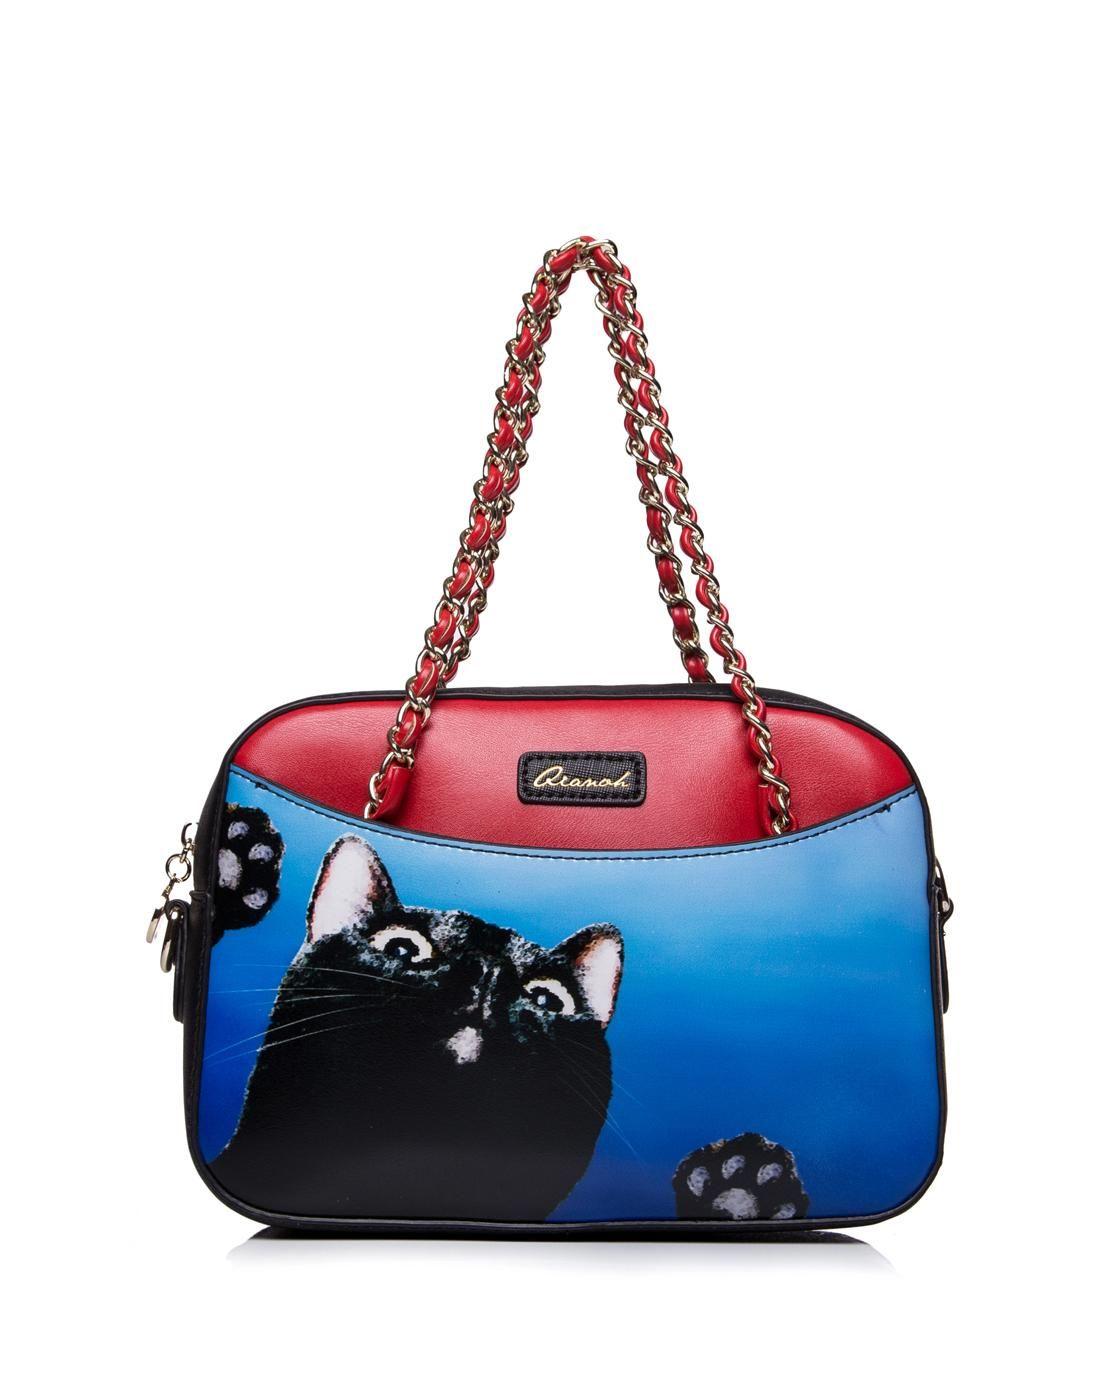 AdoreWe  VIPme Totes - QIANBH Cat Pattern Shoulder Bag with Chain Belt -  AdoreWe.com 6517d94da8977